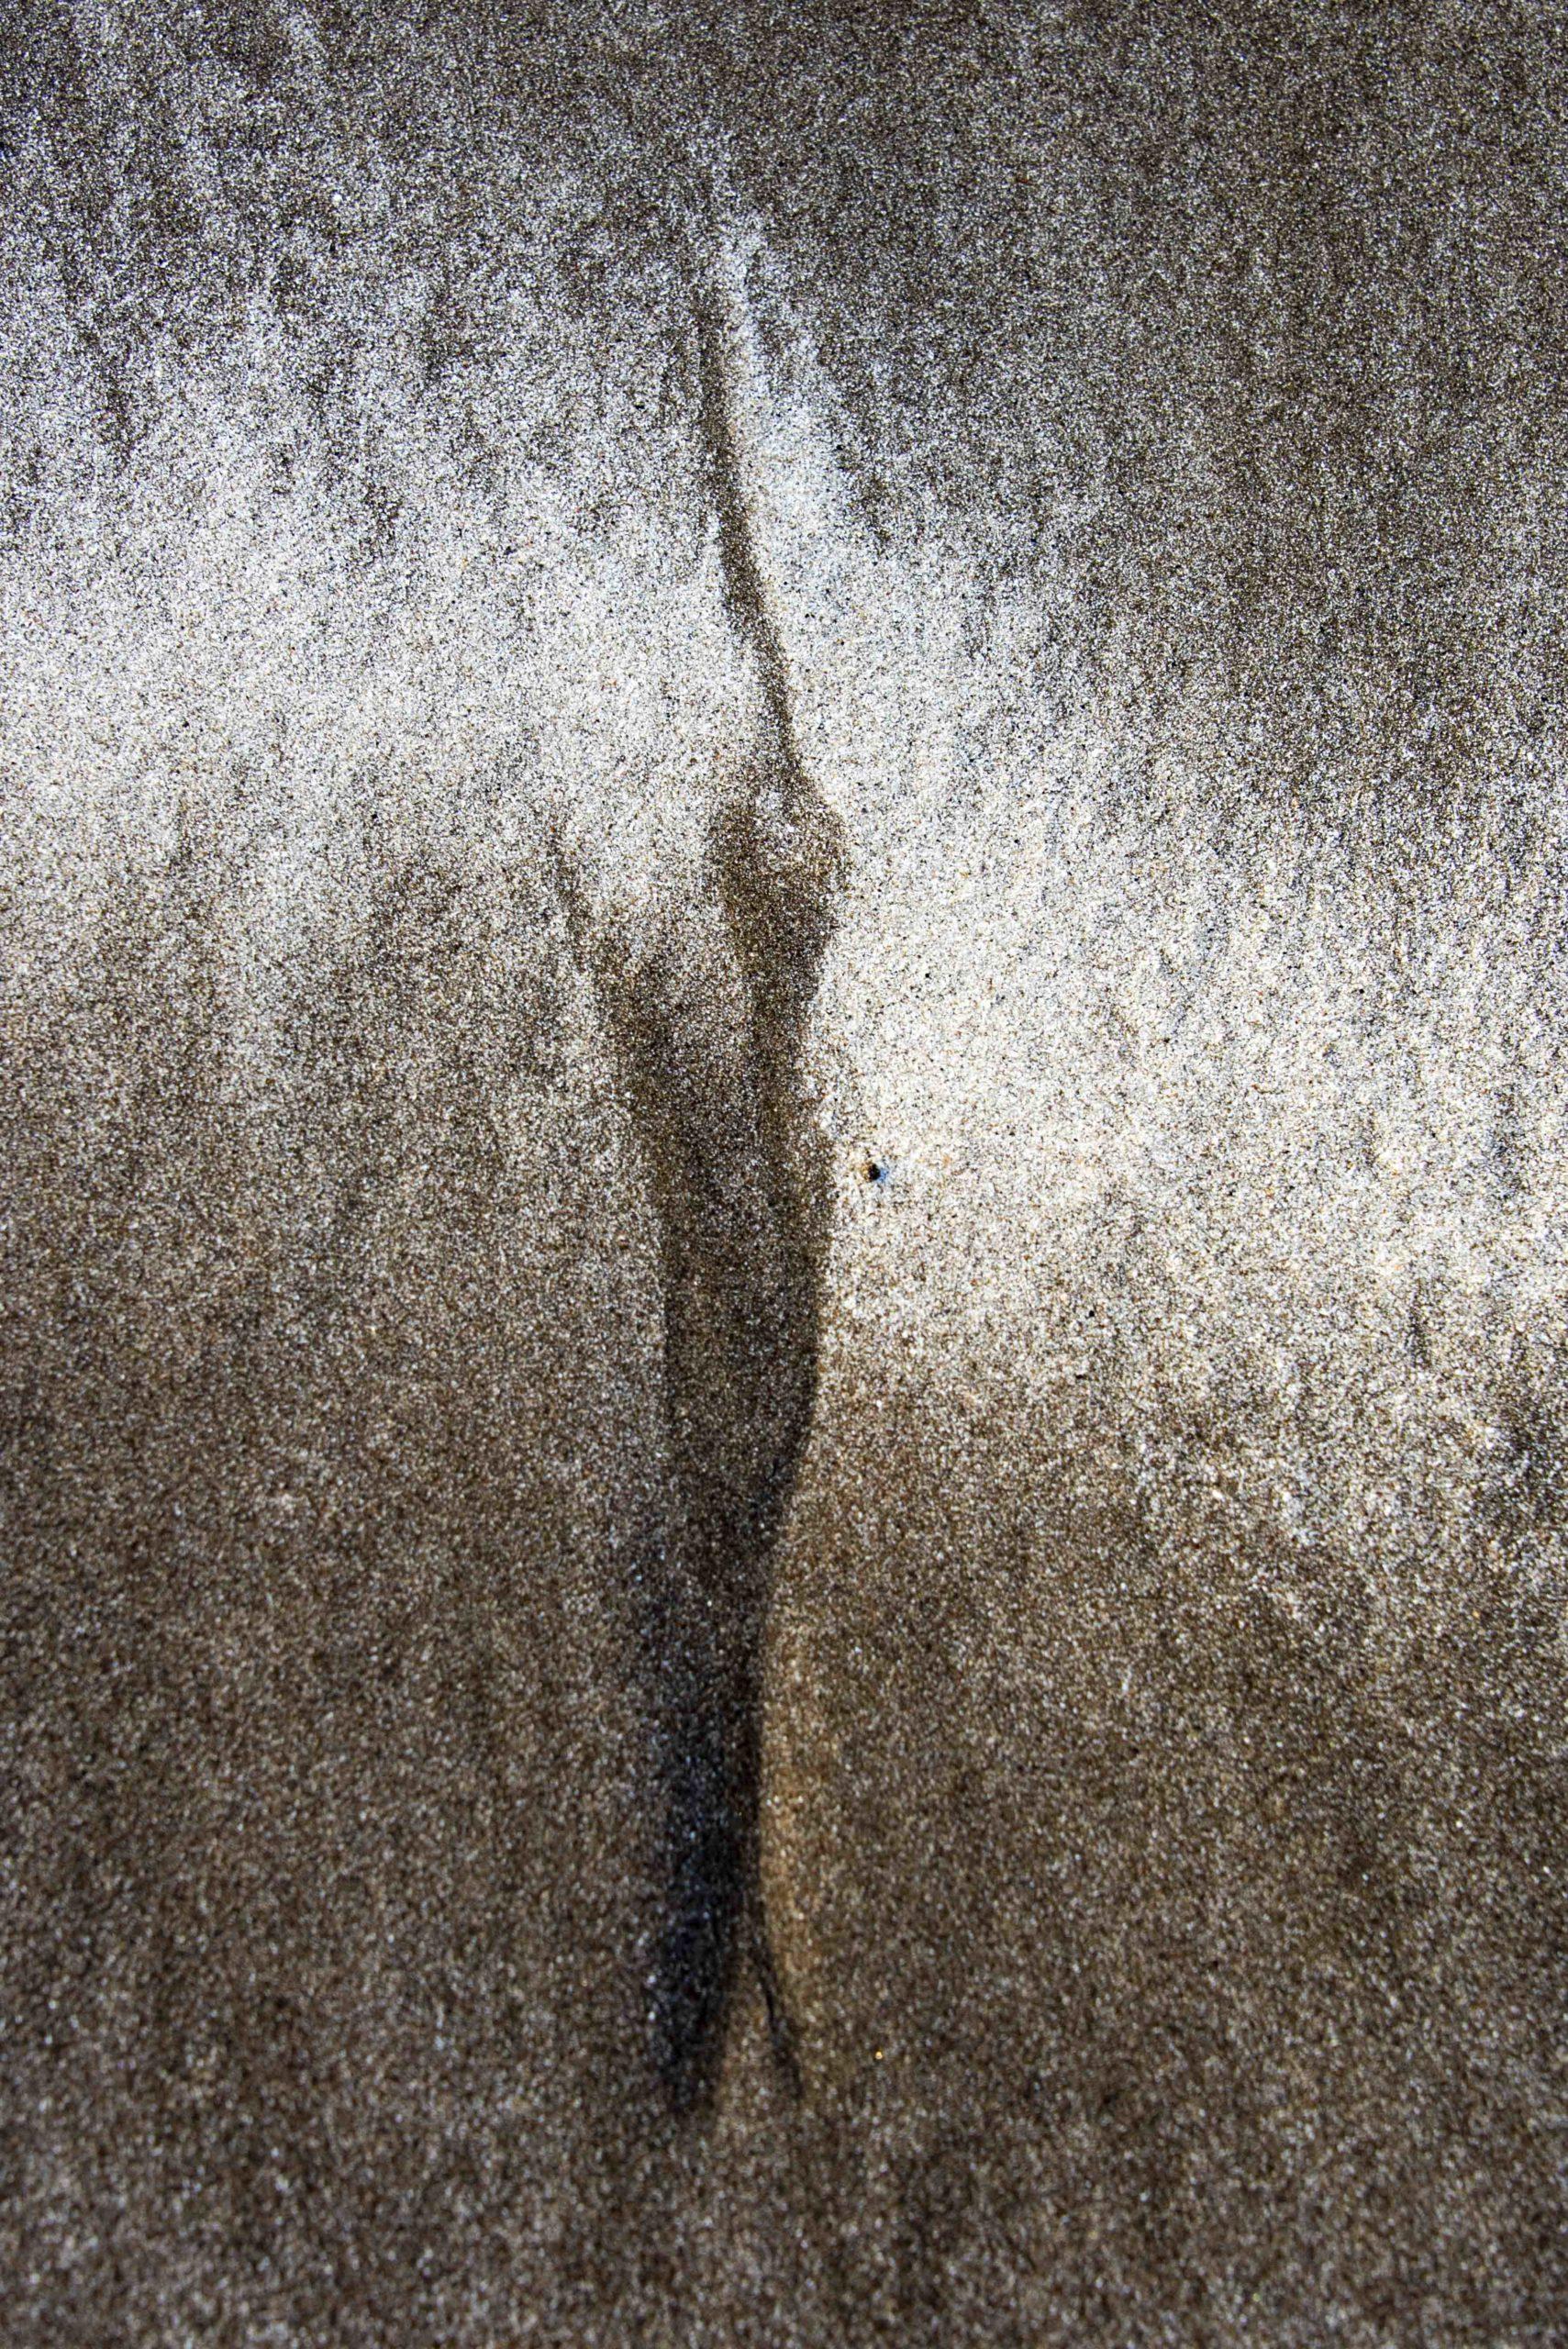 Sand_1084